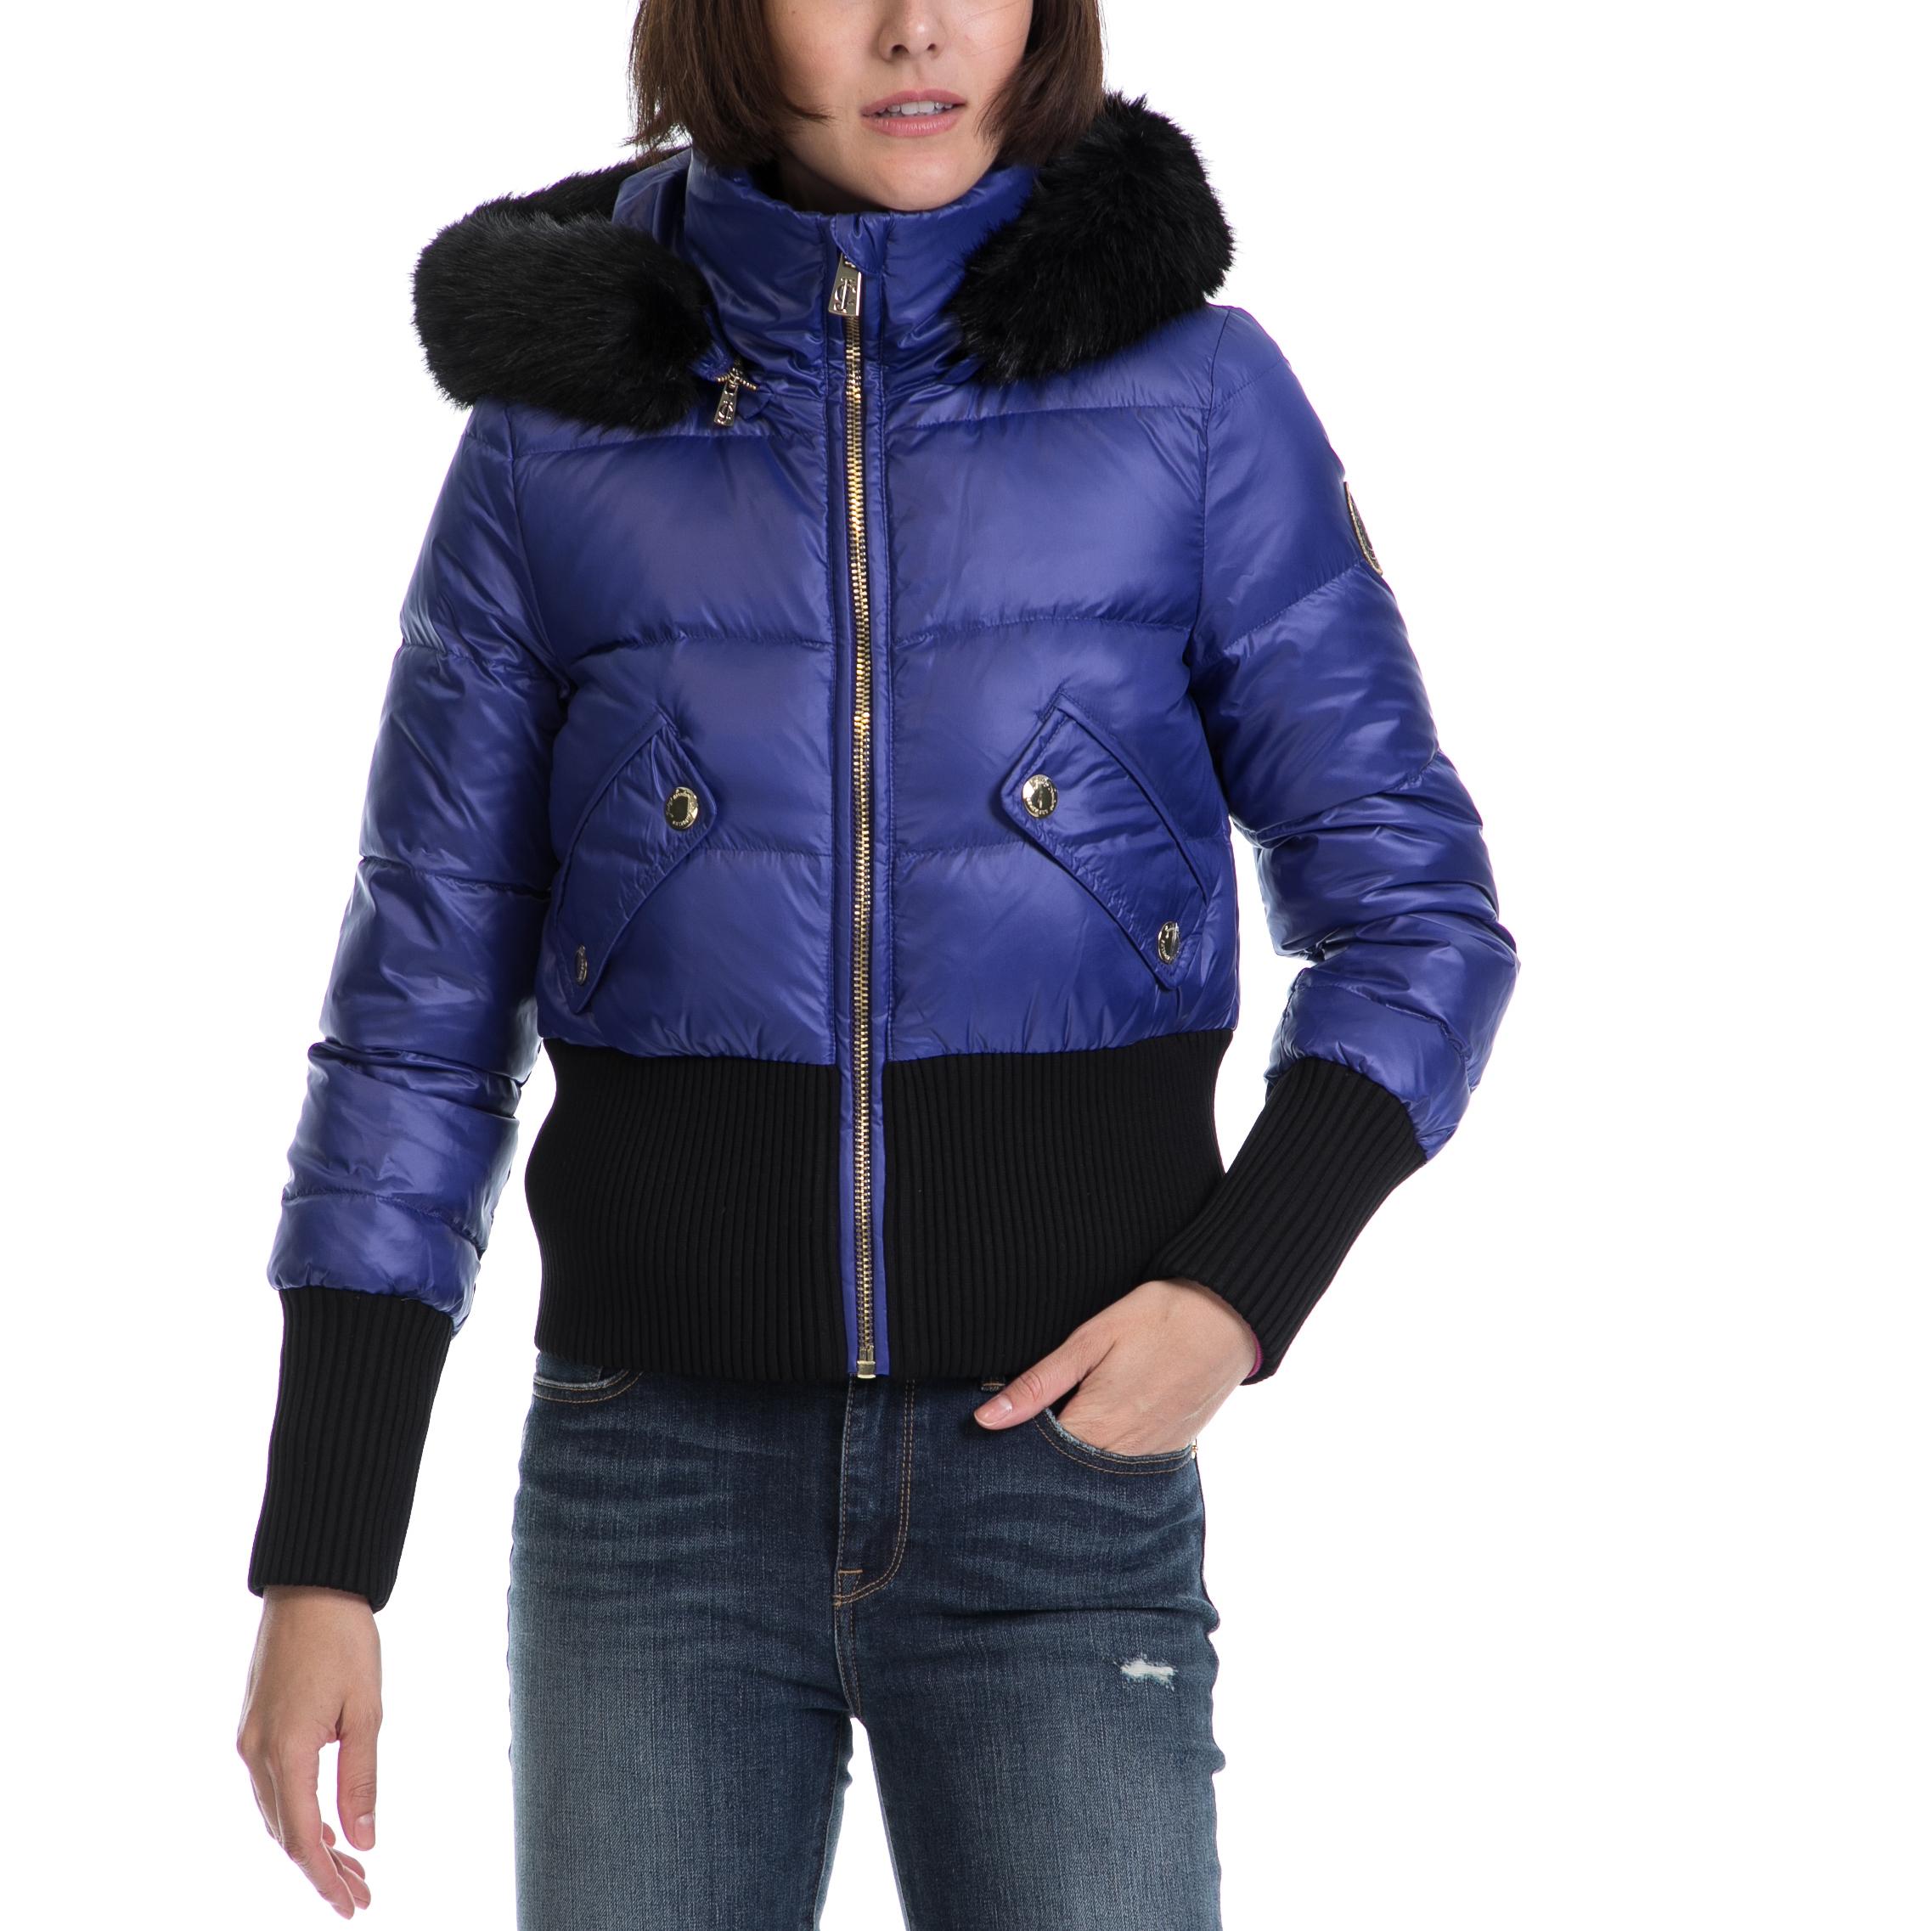 JUICY COUTURE - Γυναικείο μπουφάν JUICY COUTURE μπλε-μαύρο γυναικεία ρούχα πανωφόρια μπουφάν